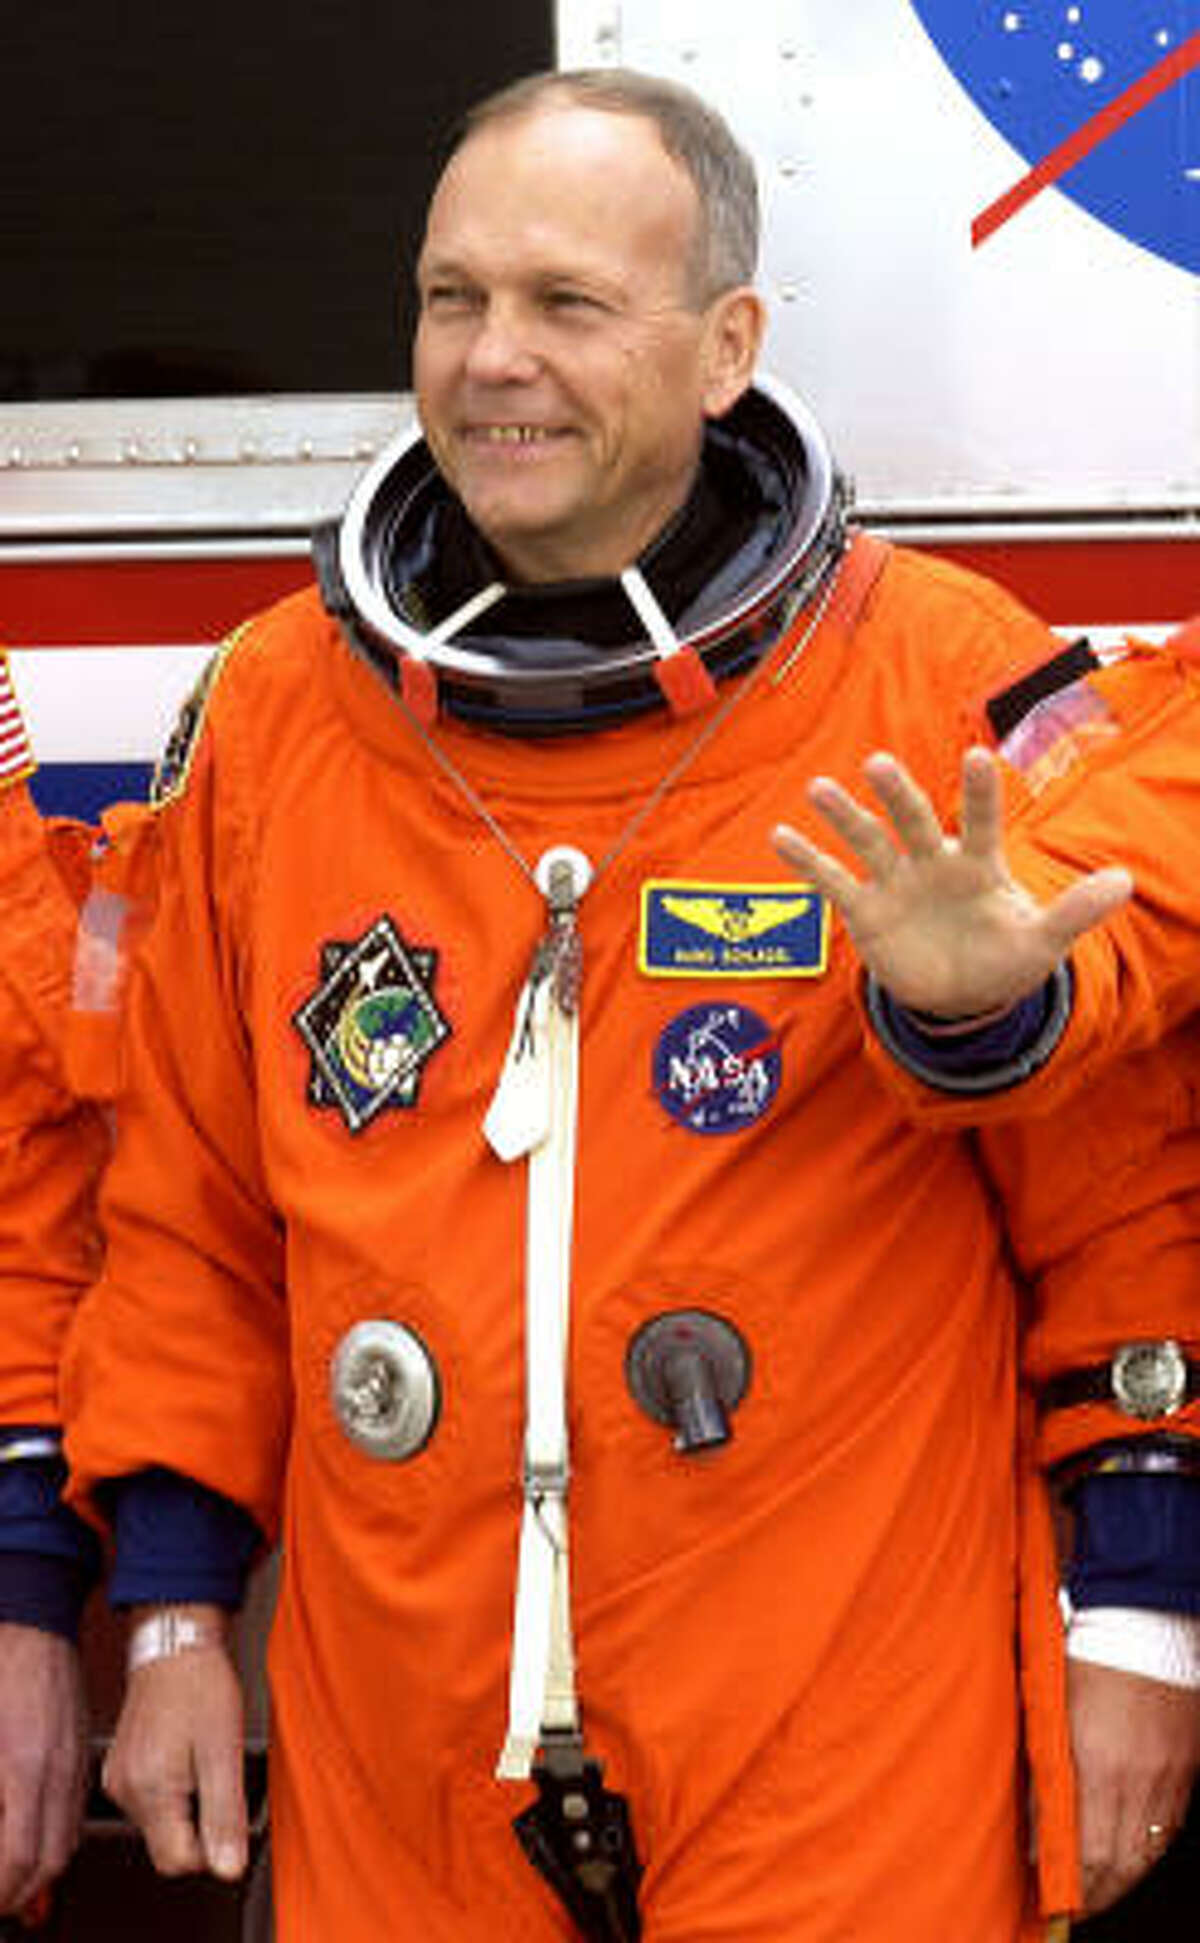 NASA said German astronaut Hans Schlegel's illness was not life-threatening.